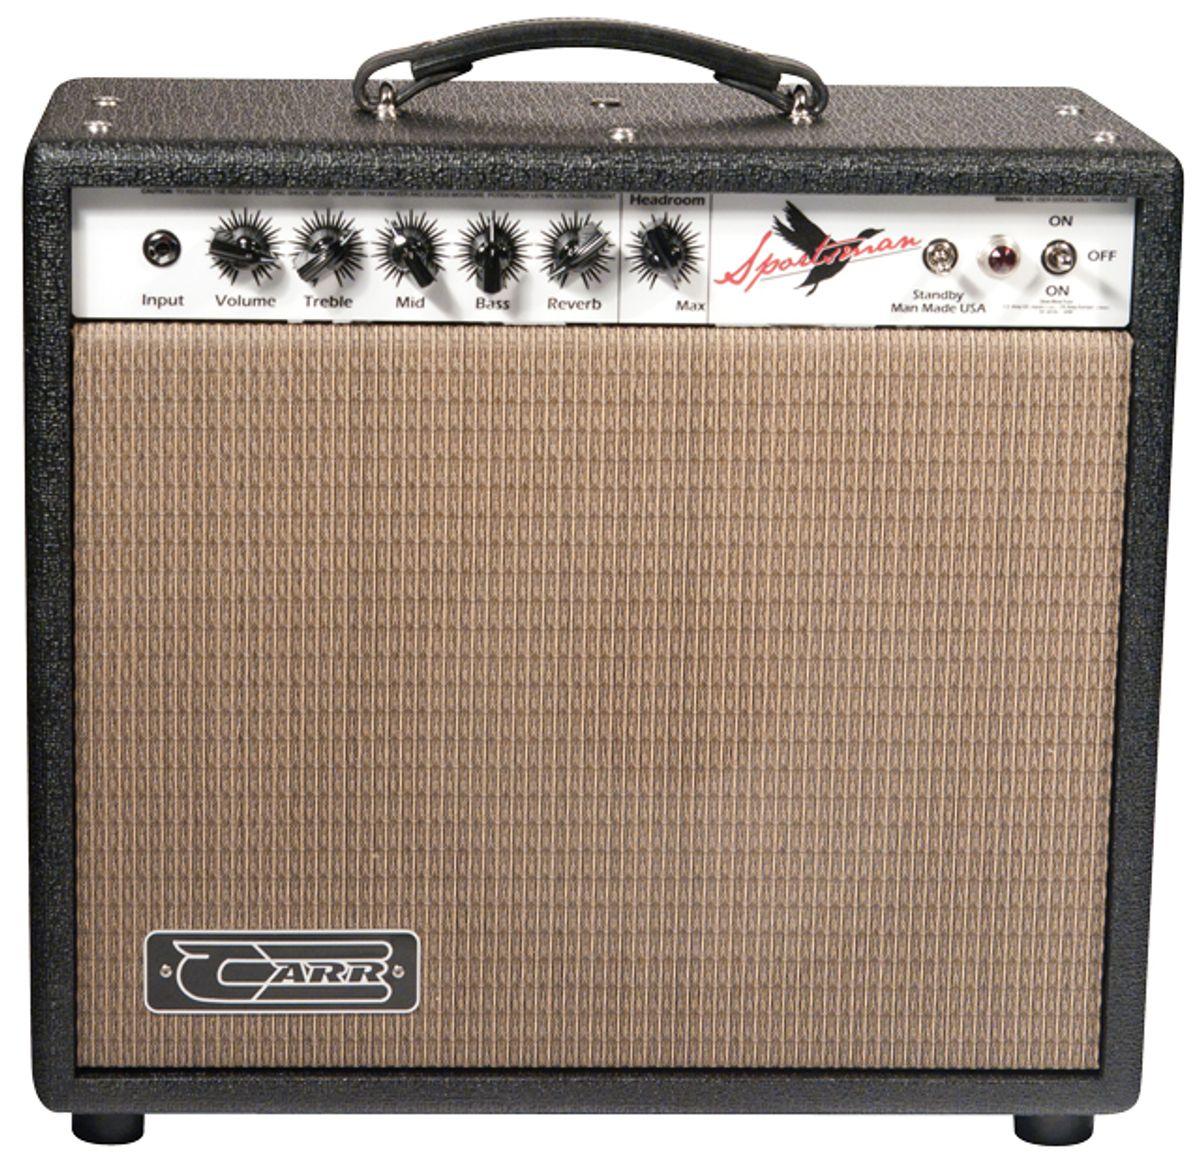 Carr Amplifiers Sportsman Amp Review